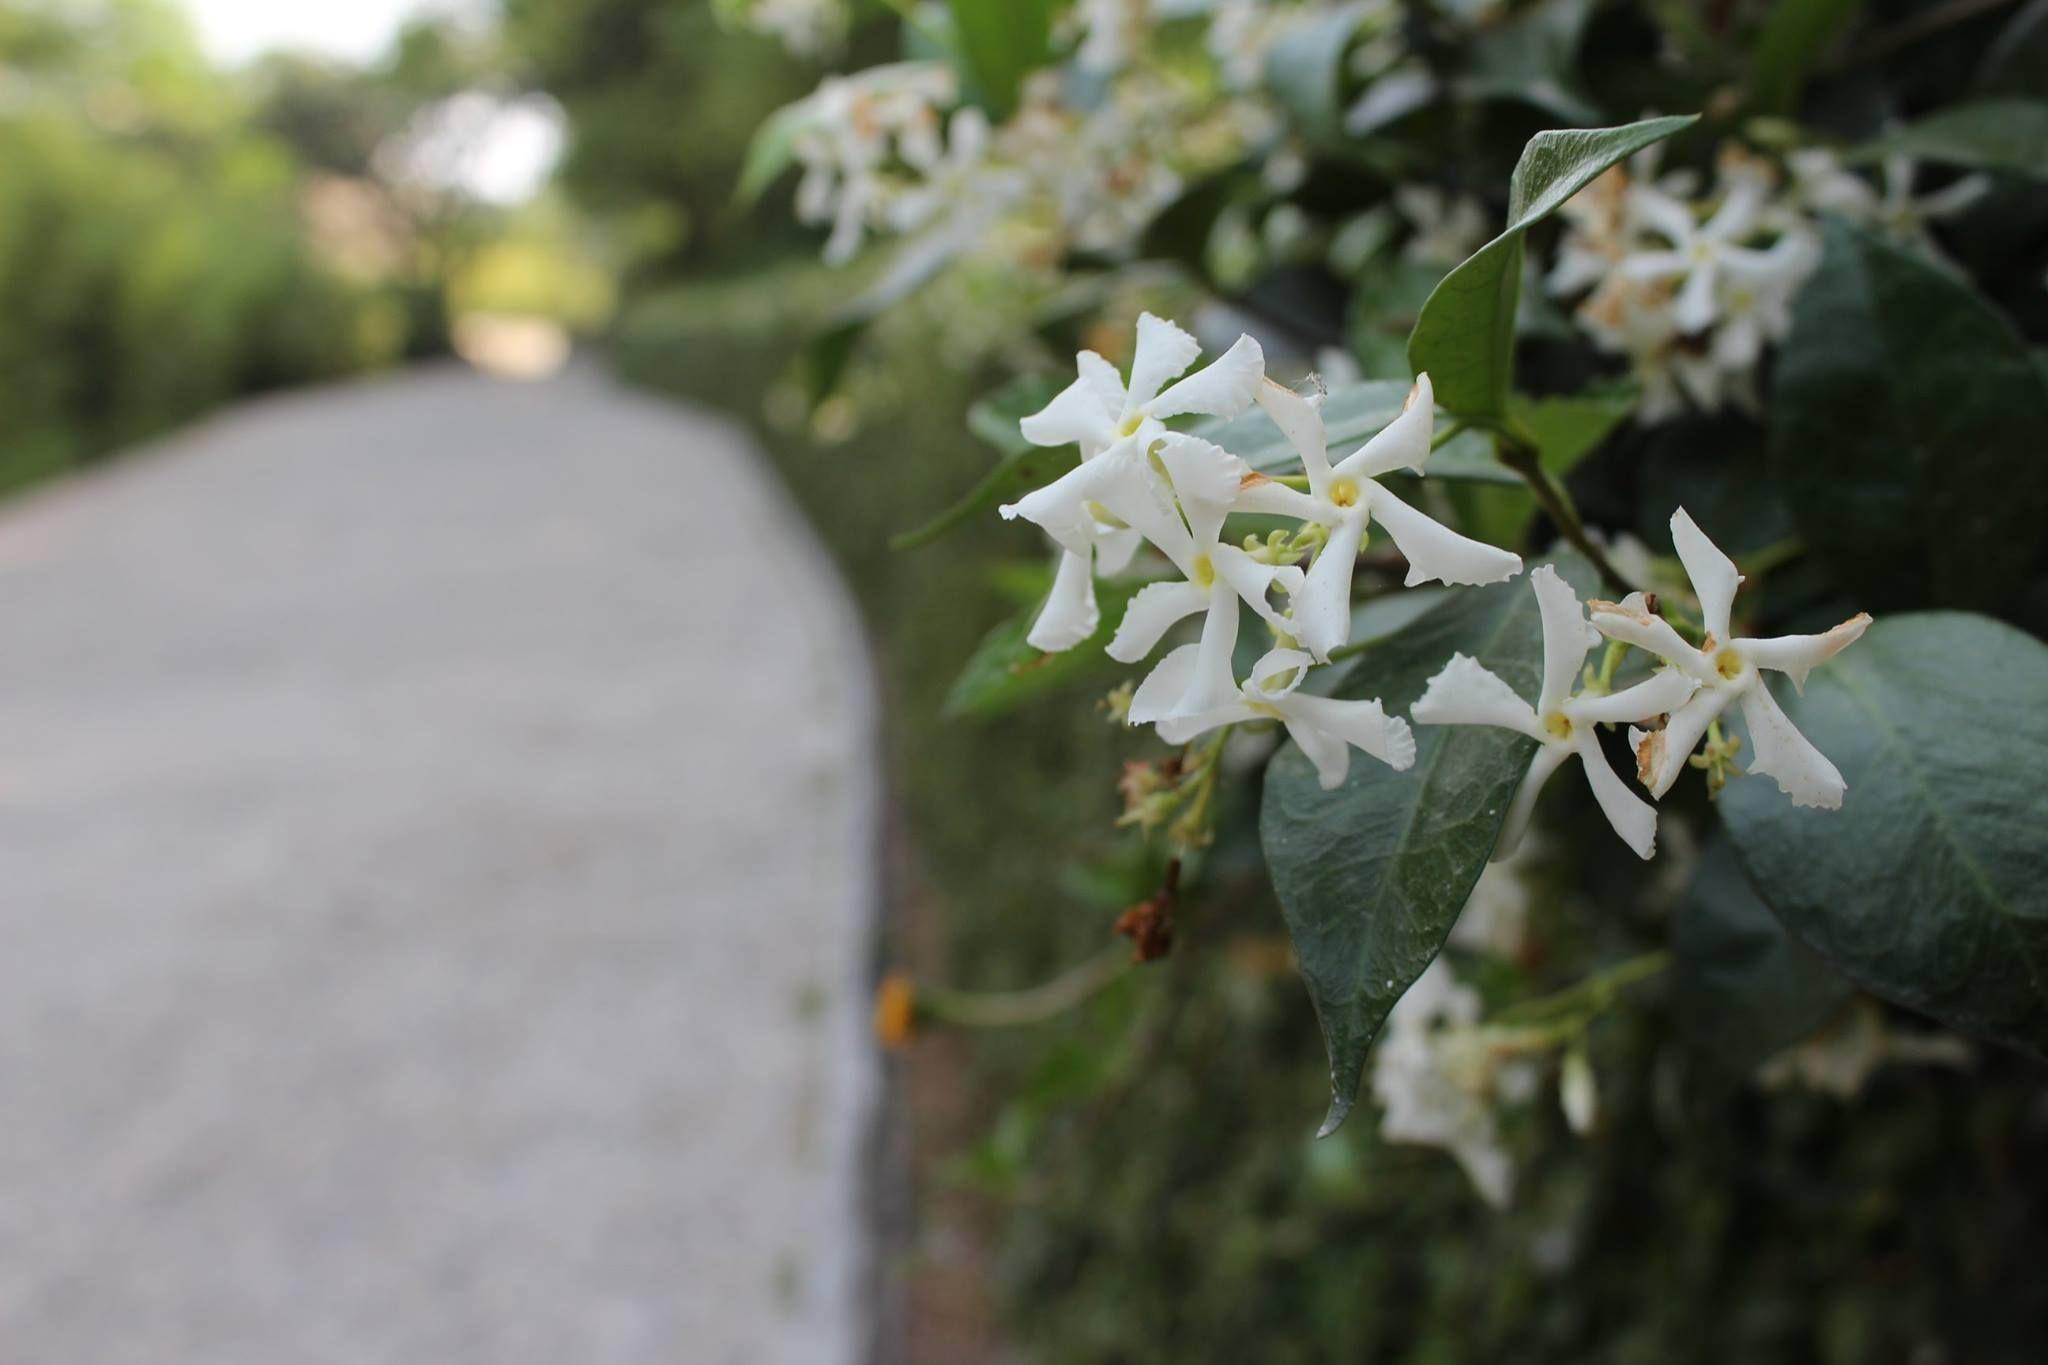 Star Jasmine At Vanamalsiestate Flowers In Bloom At Vana Malsi